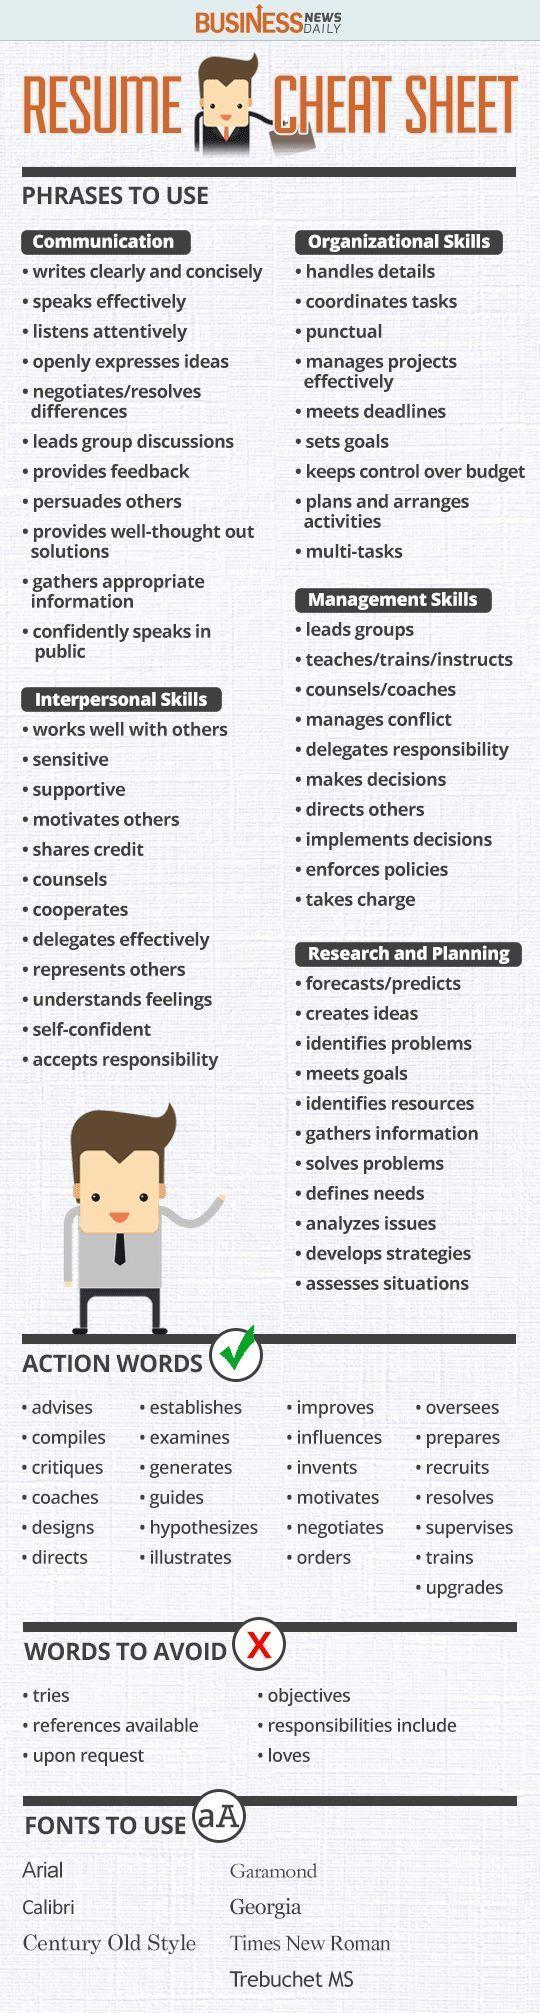 Your Resume Cheat Sheet Writing Guide - businessnewsdaily.com